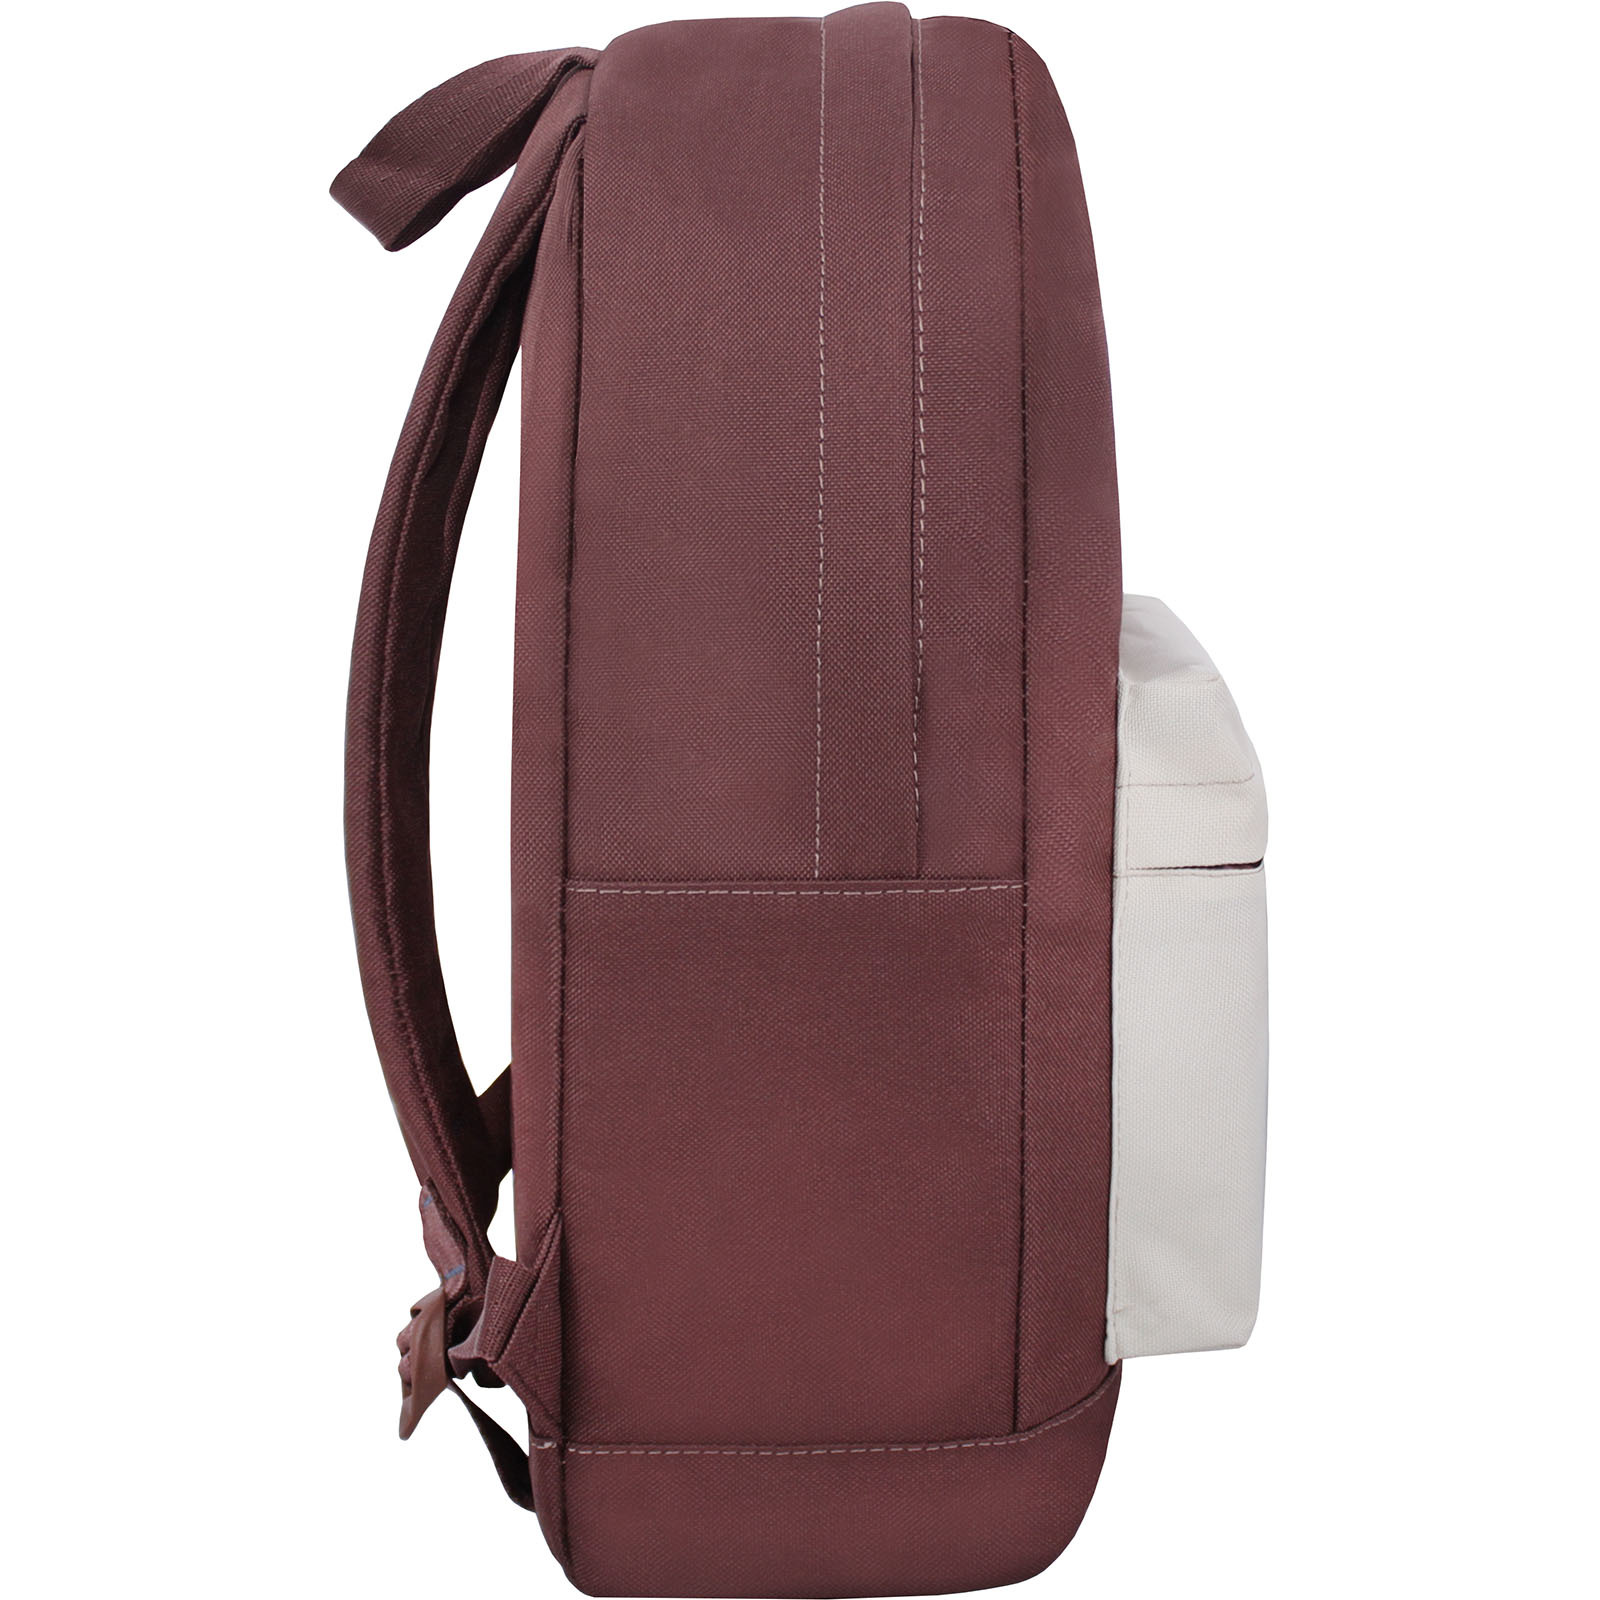 Рюкзак Bagland Молодежный W/R 17 л. Коричневый/бежевий (00533662) фото 2